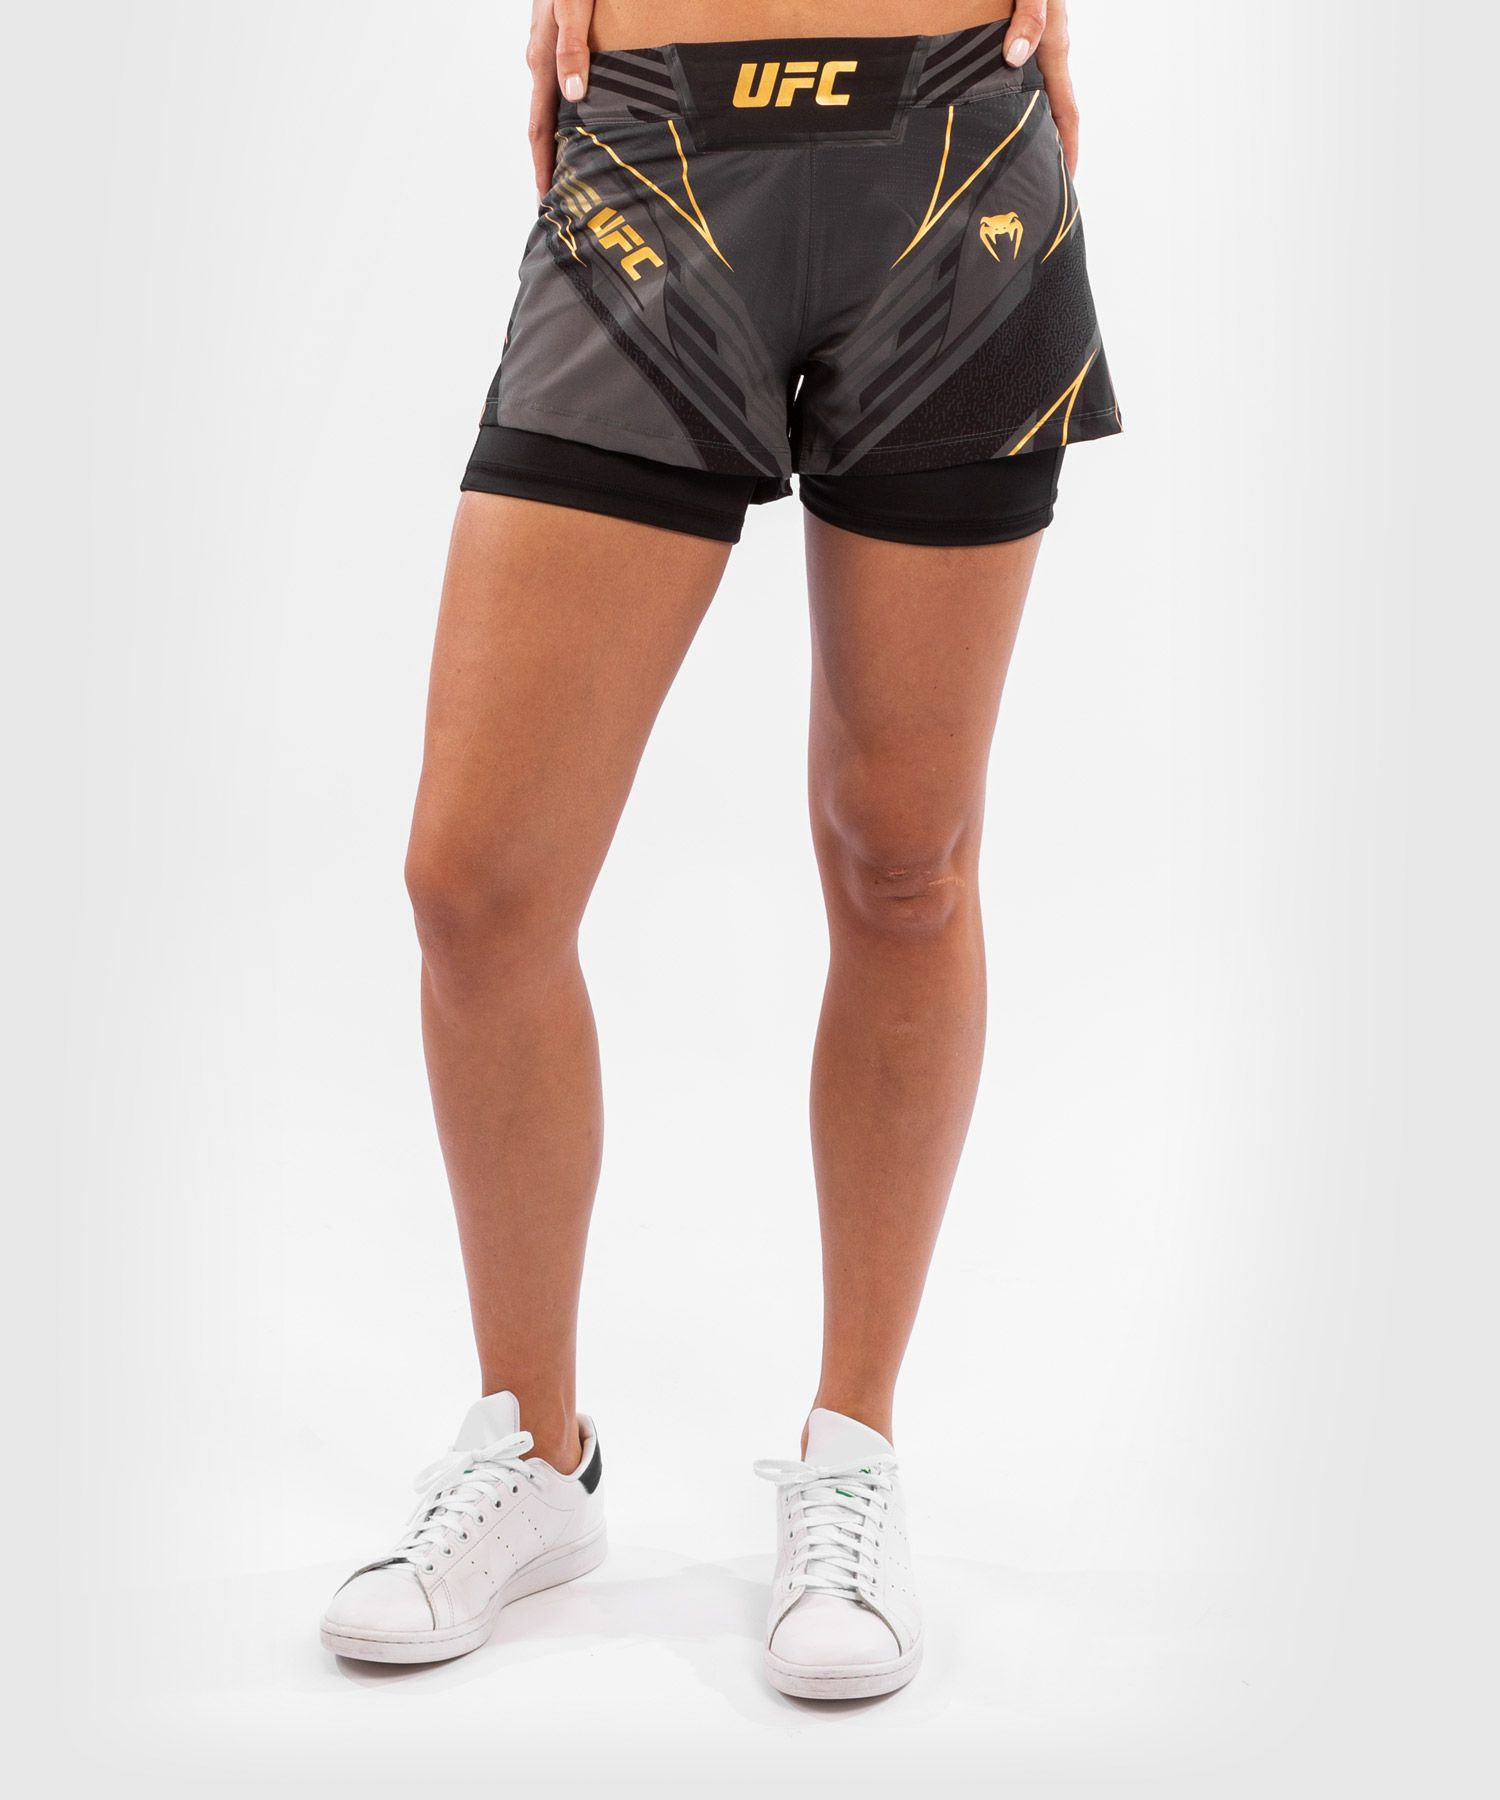 UFC Venum Authentic Fight Night Women's Shorts - Short Fit - Champion